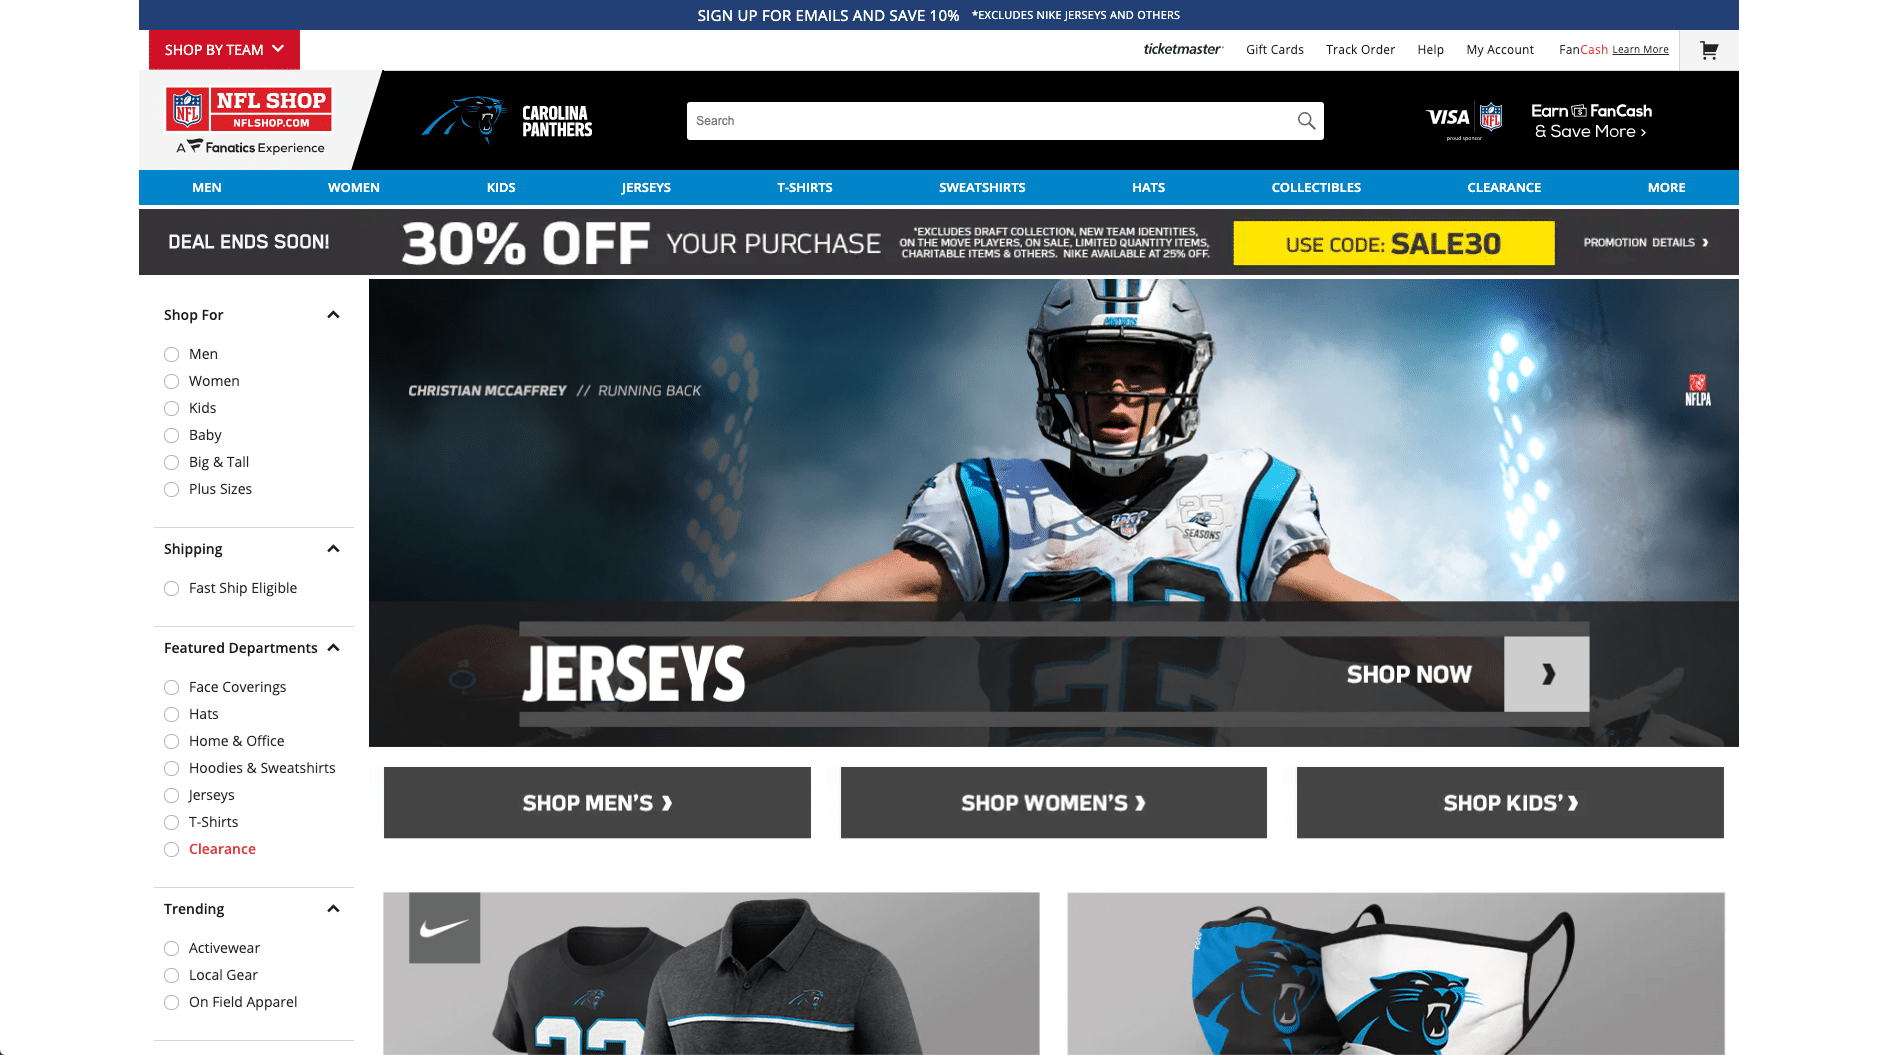 Carolina Panthers, de officiële NFL winkel